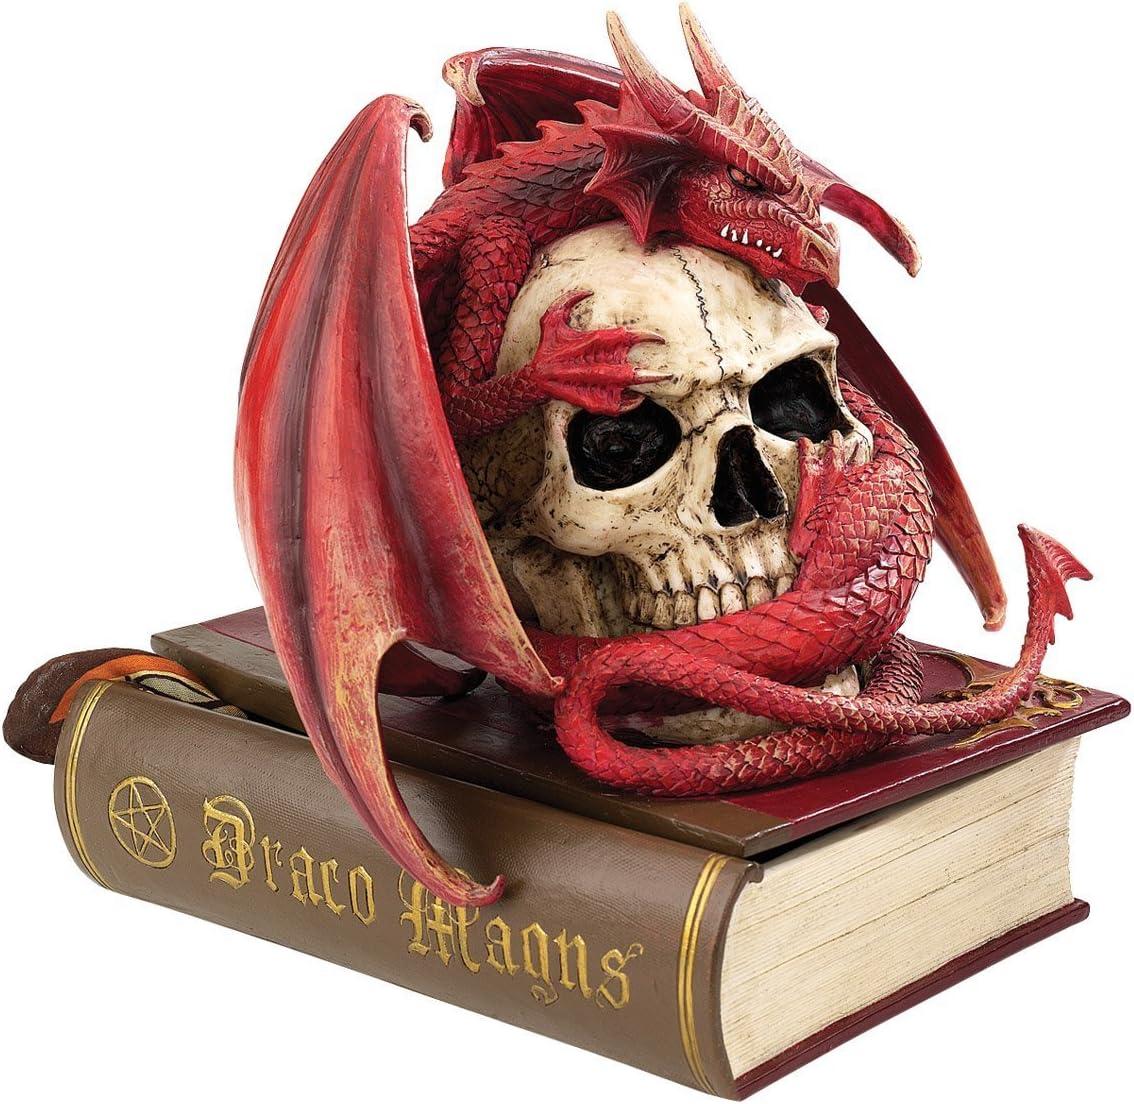 Design Our shop most popular Toscano Blood Discount is also underway Dragon Contemplation Sculptural Box